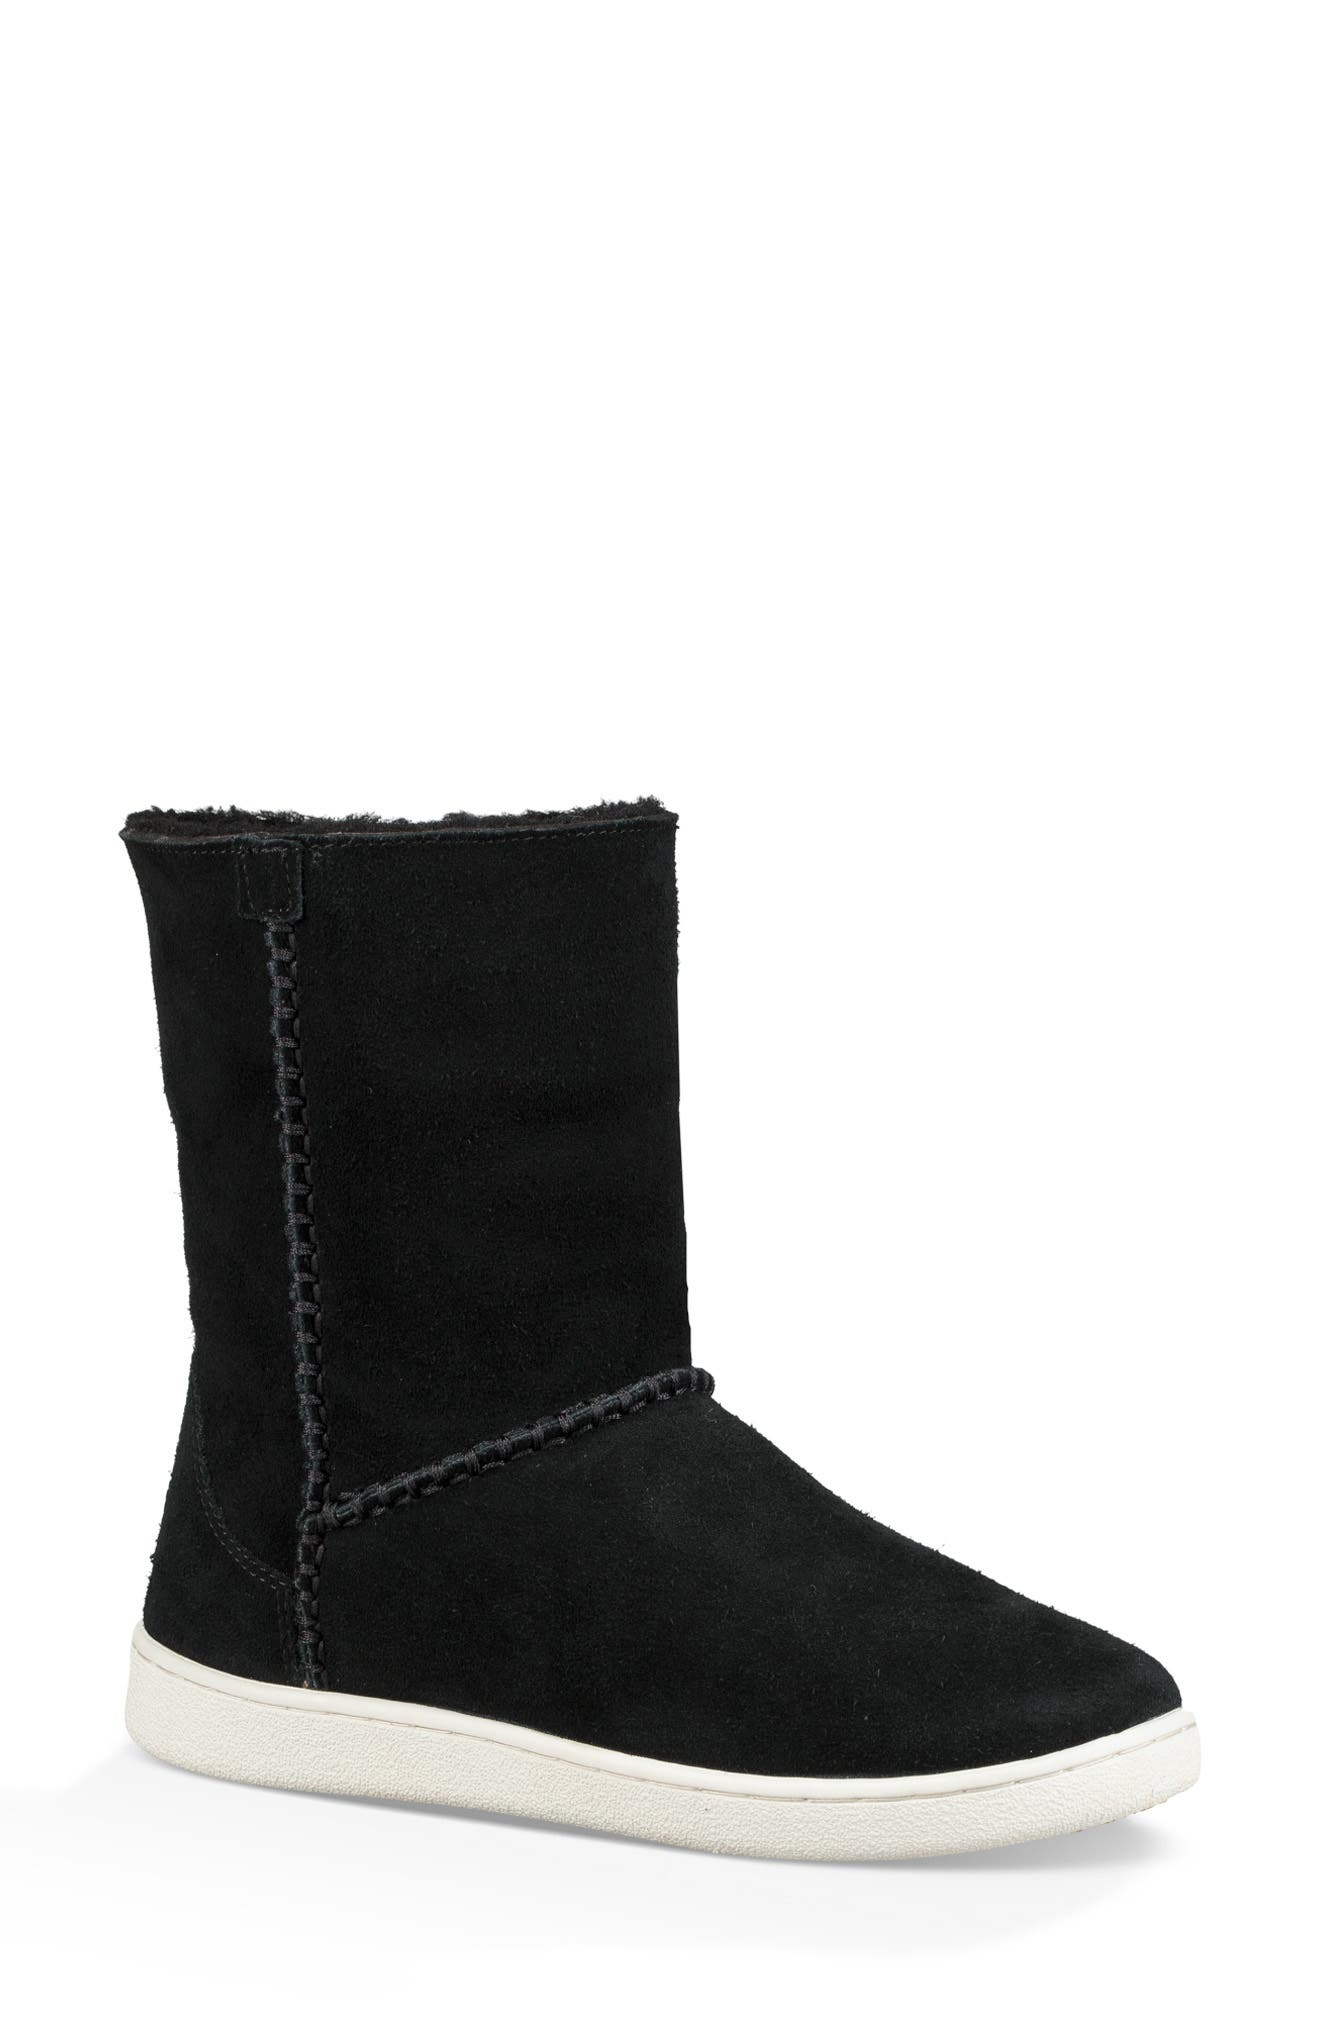 Mika Classic Genuine Shearling Sneaker,                             Alternate thumbnail 2, color,                             BLACK